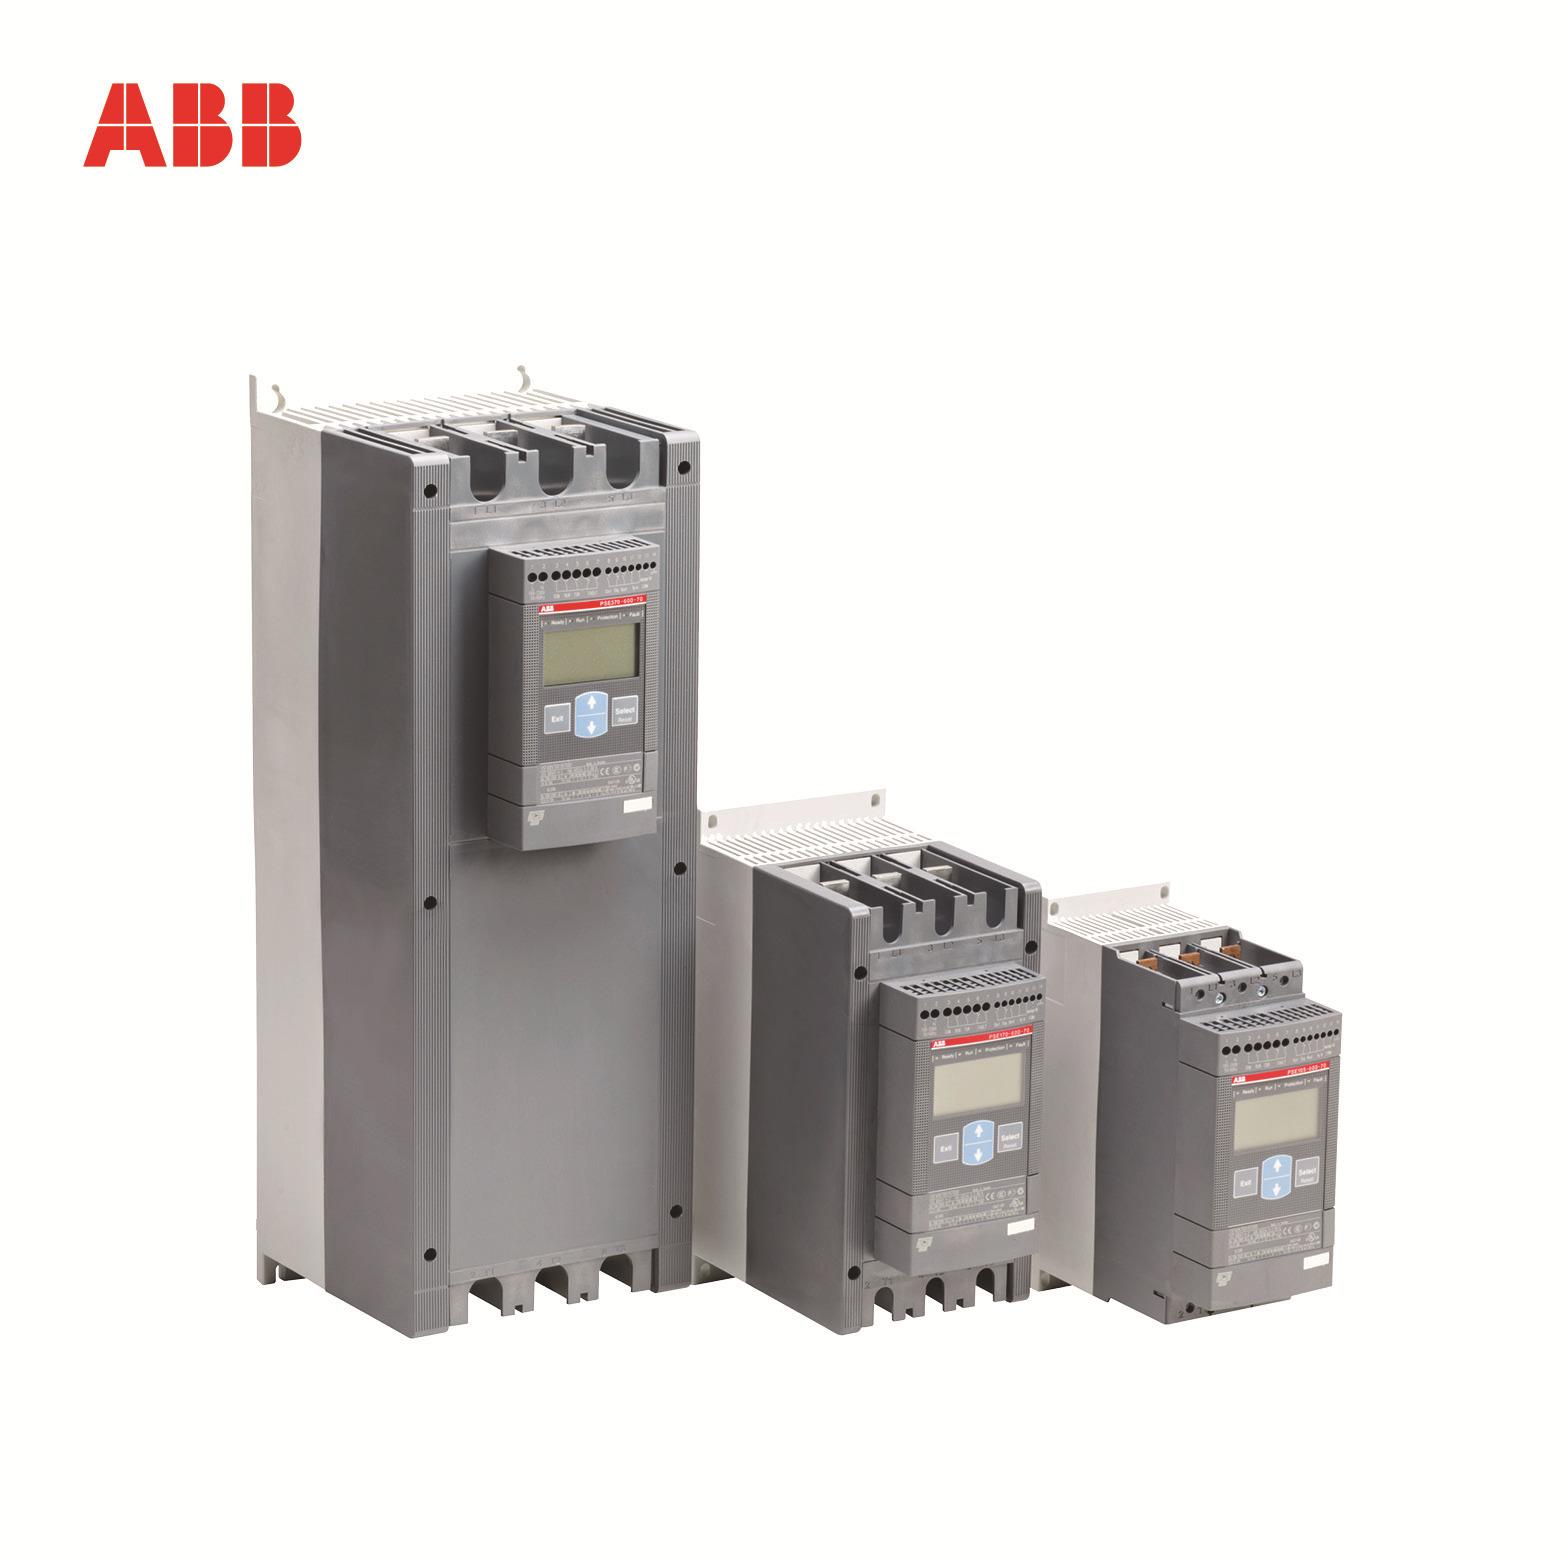 ABB easy-to-use soft starter PSE170-600-70